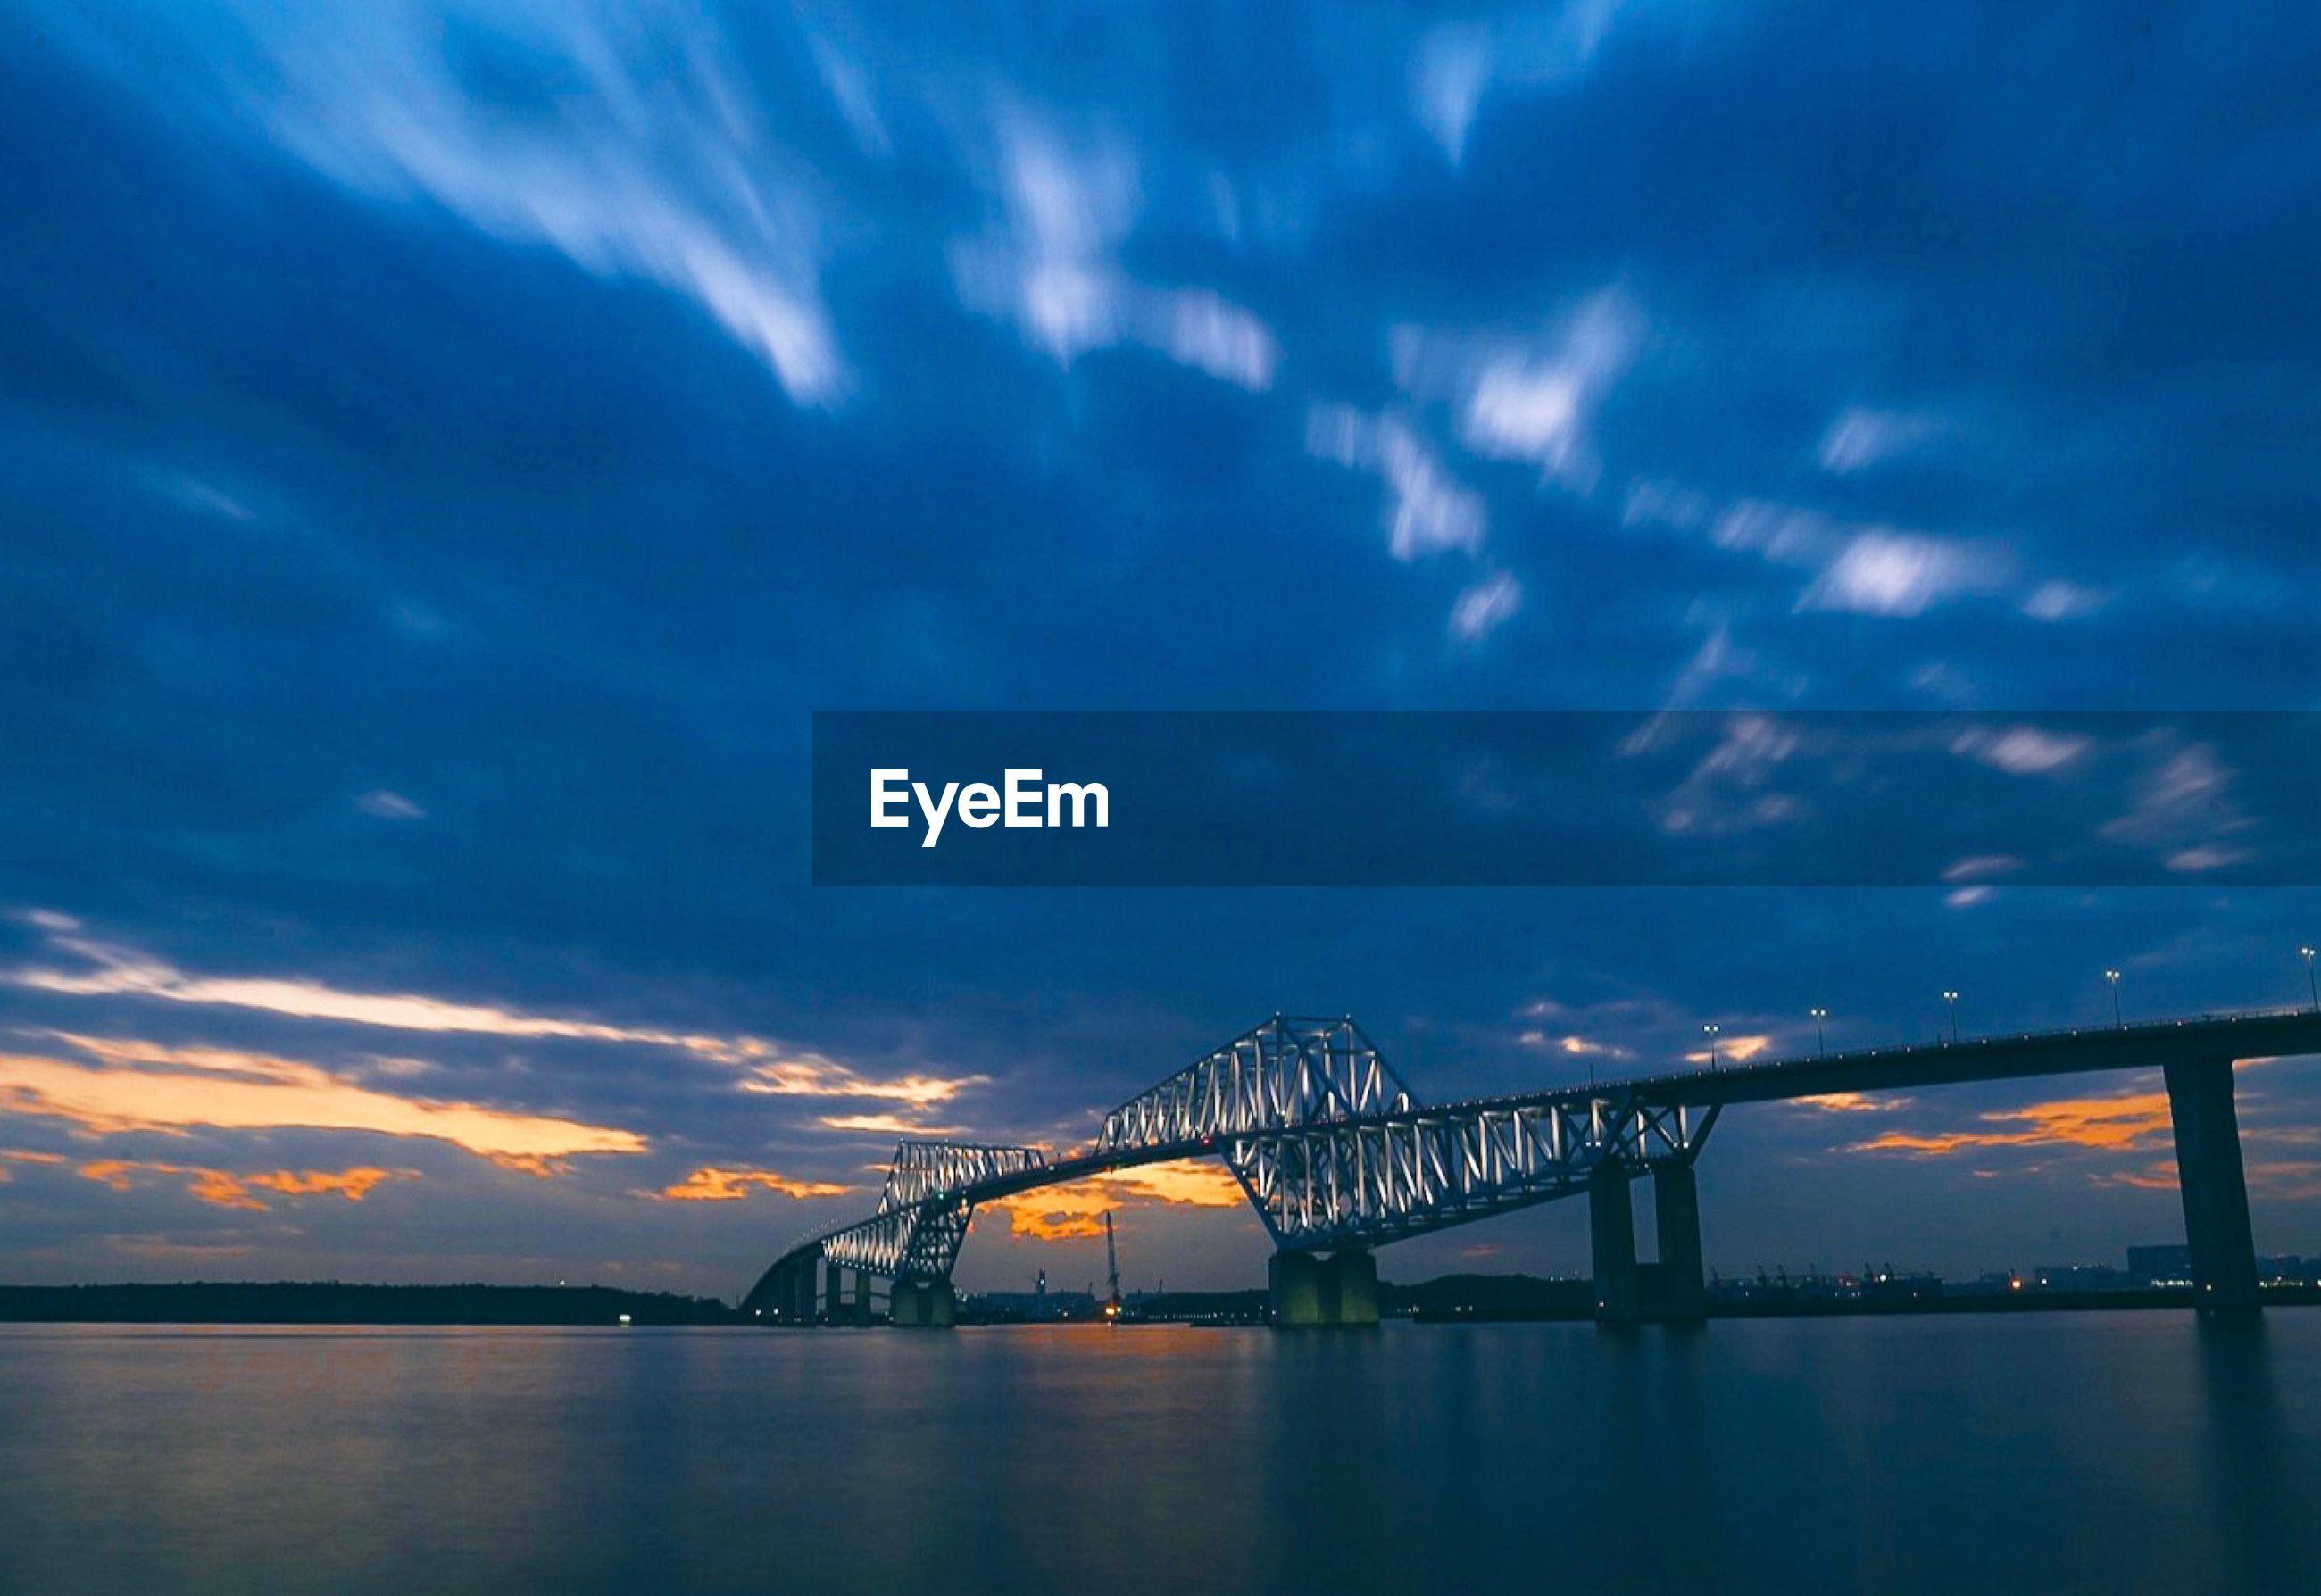 Illuminated bridge over sea against sky at sunset